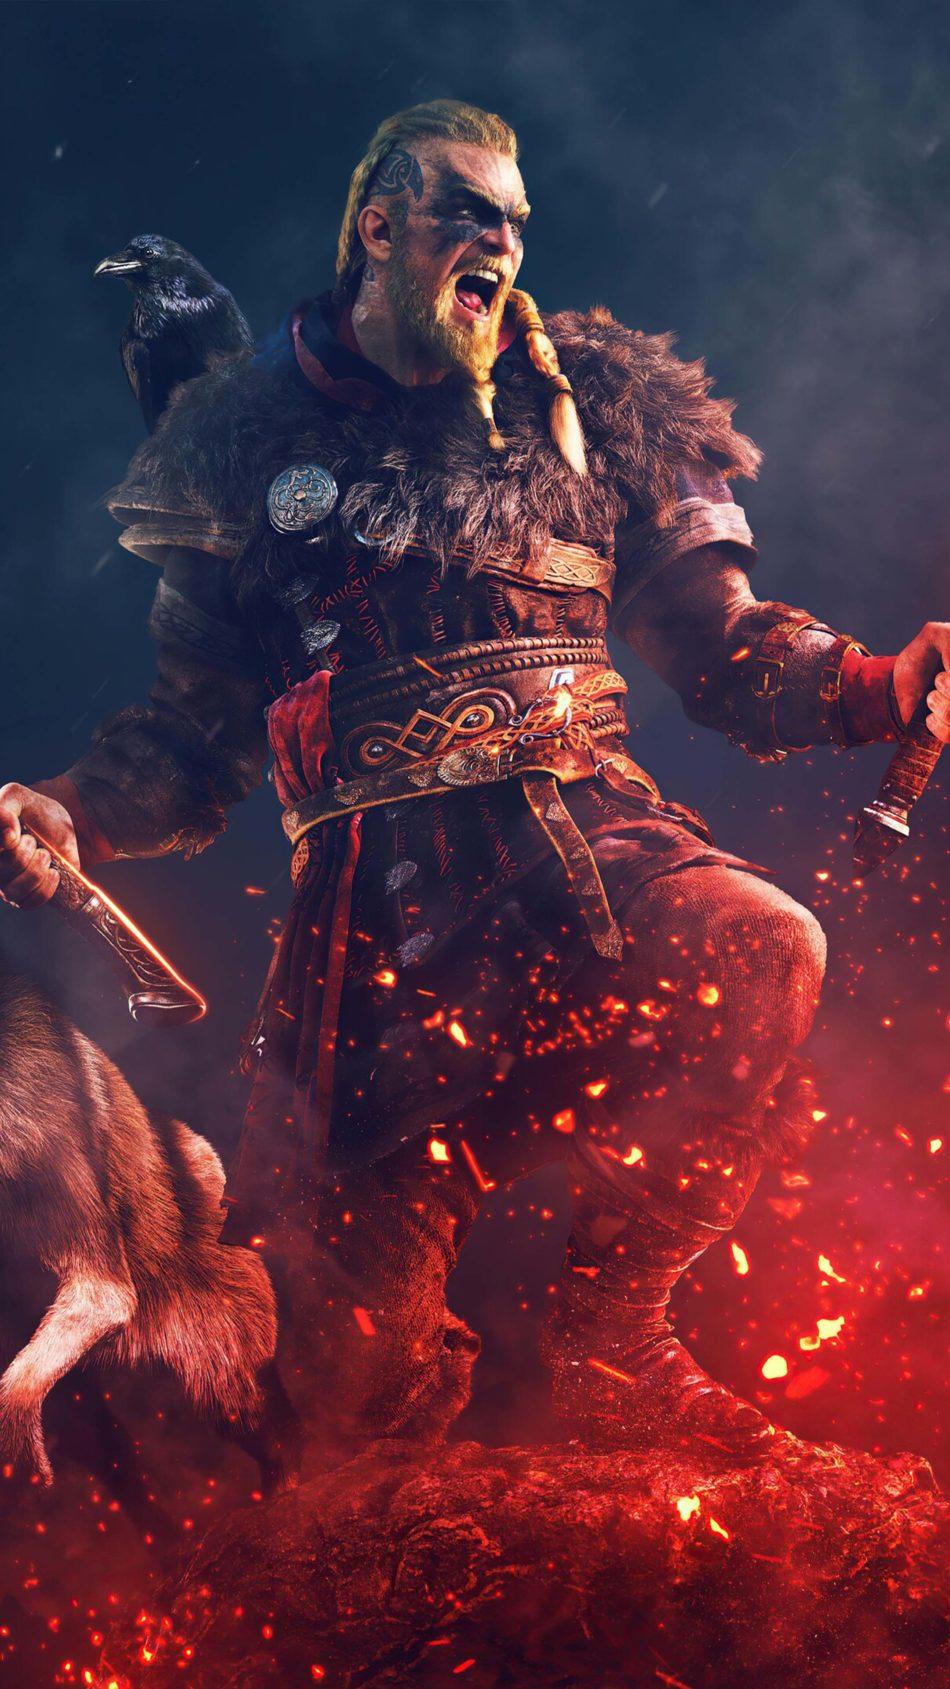 Assassin's Creed Valhalla Artwork 4K Ultra HD Mobile Wallpaper